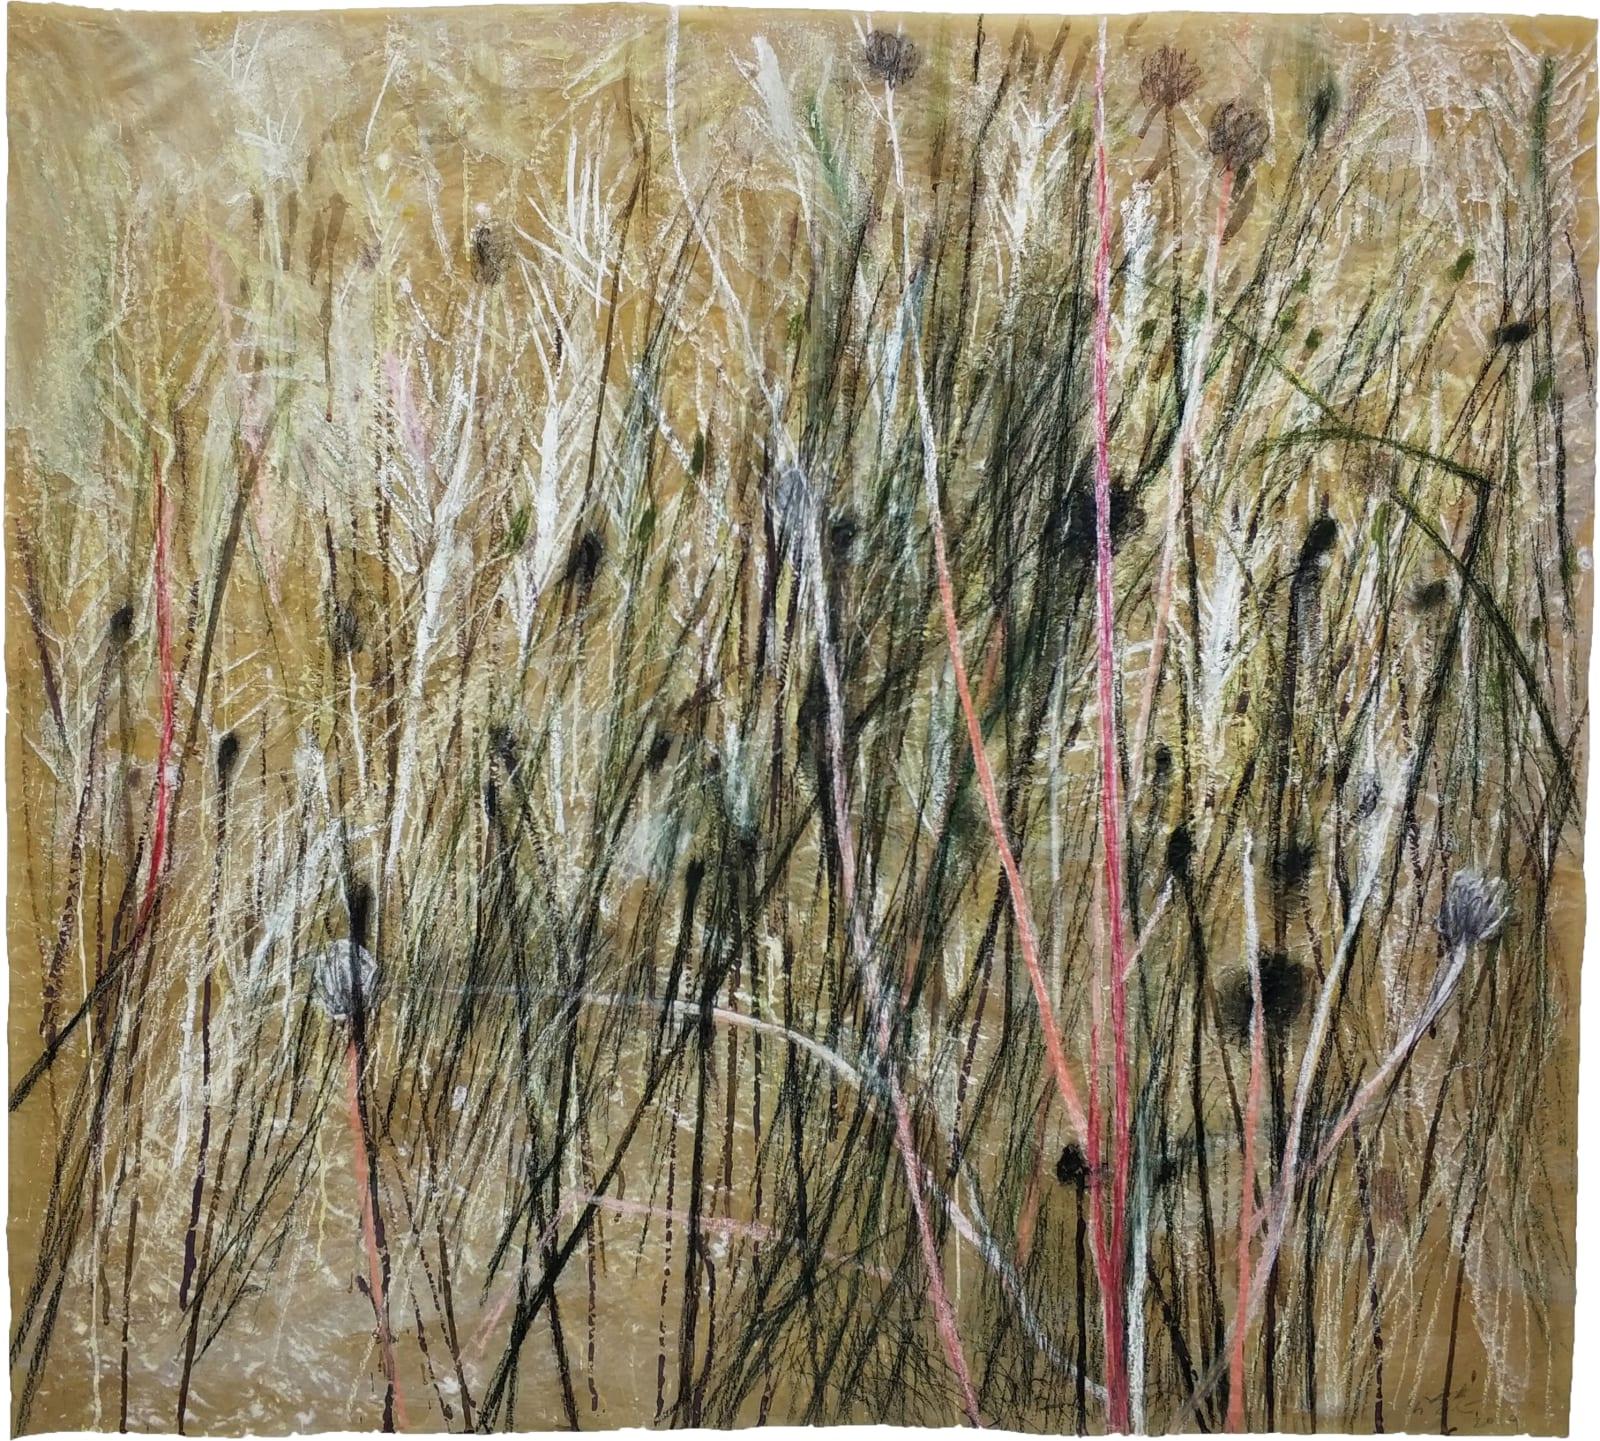 Wang Gongyi 王公懿, Leaves of Grass No.7 草葉集之七, 2019